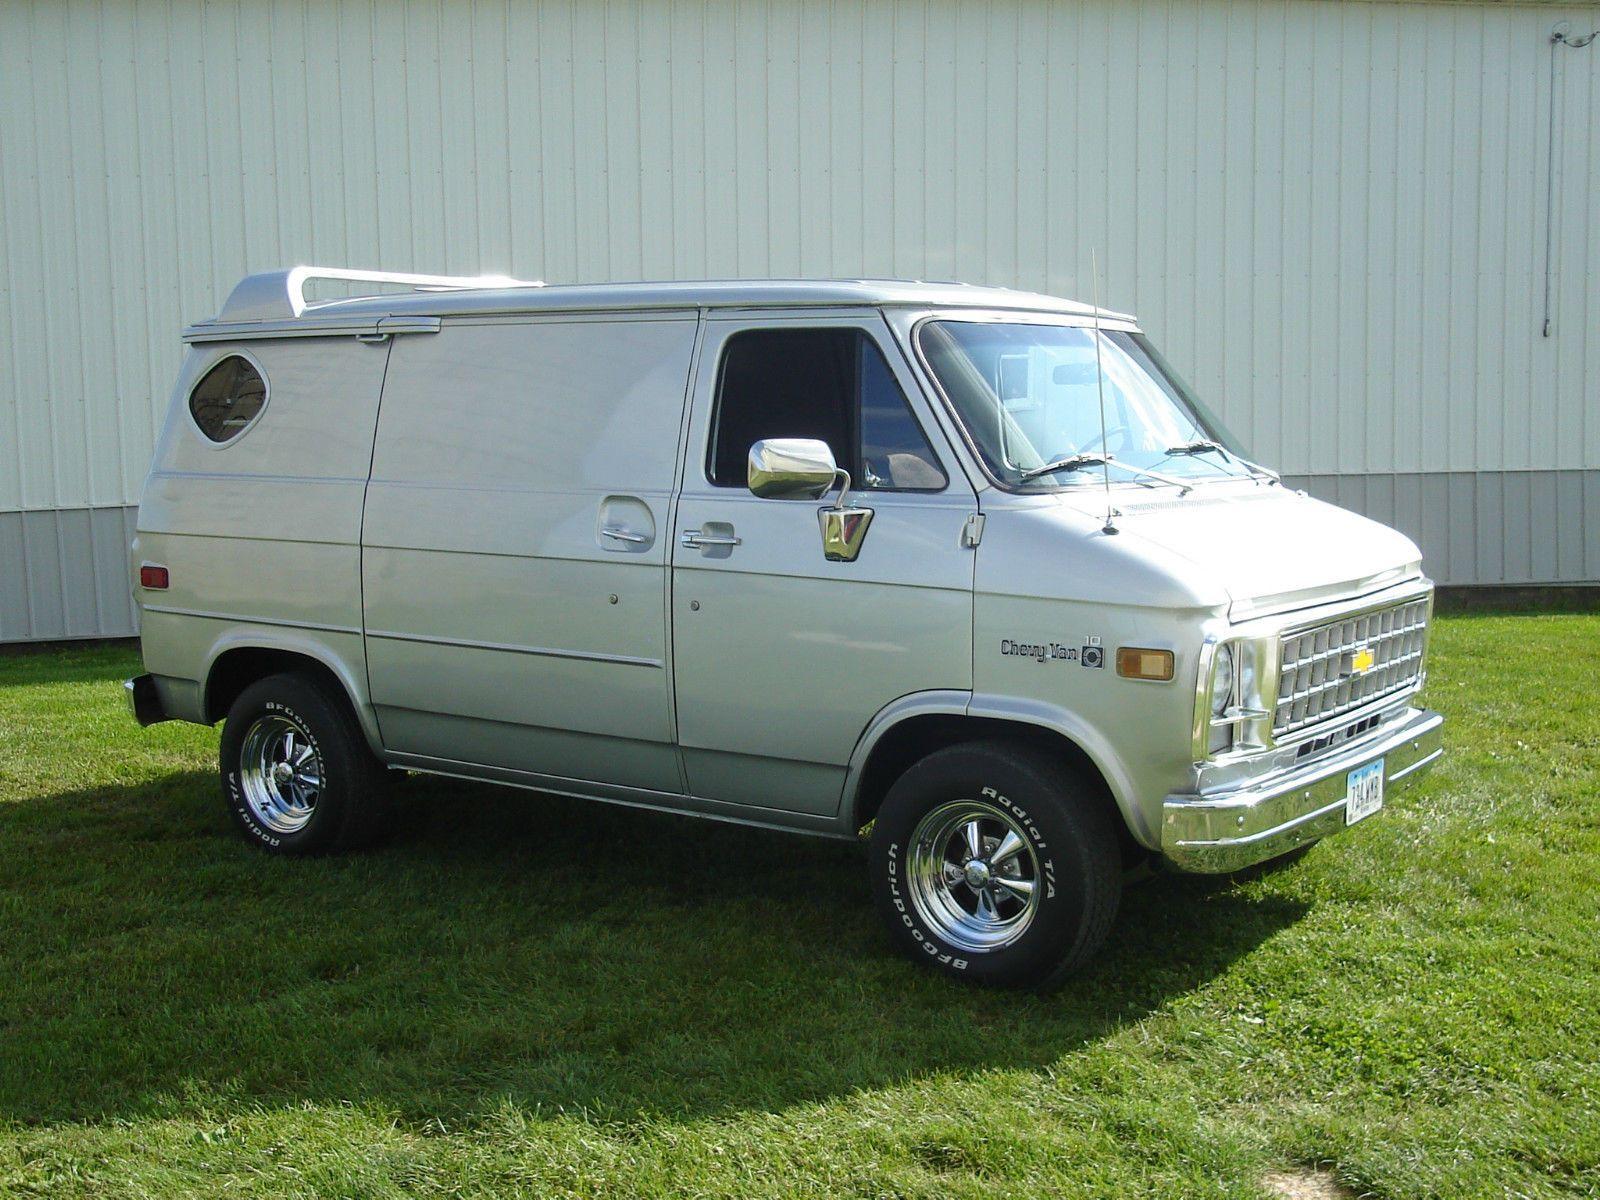 1982 Chevrolet G20 Van Maintenance  Restoration Of Old